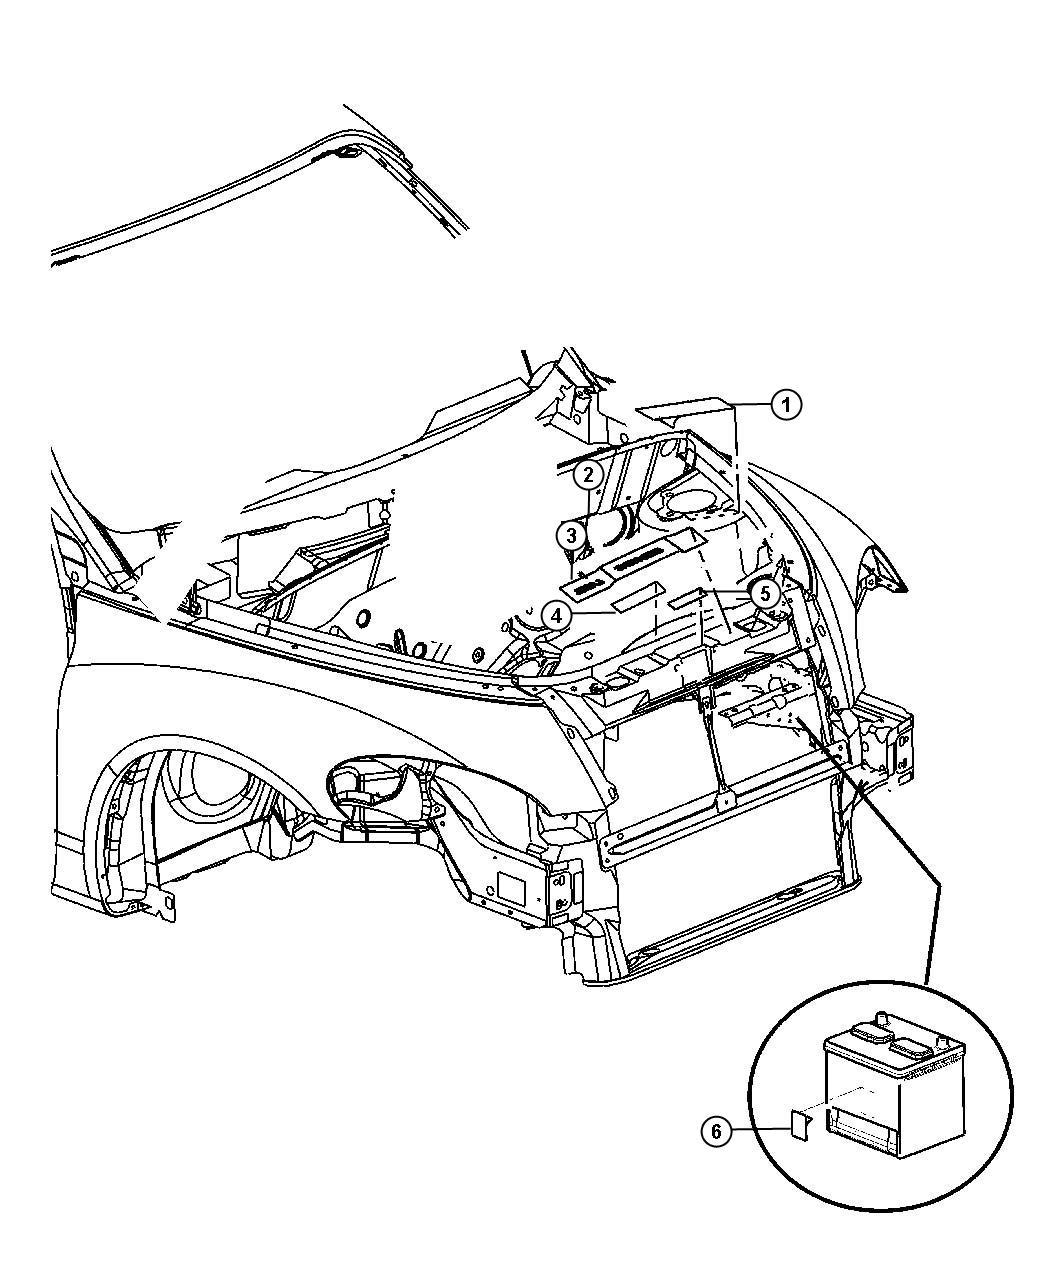 2009 Chrysler PT Cruiser Label. Coolant system cap